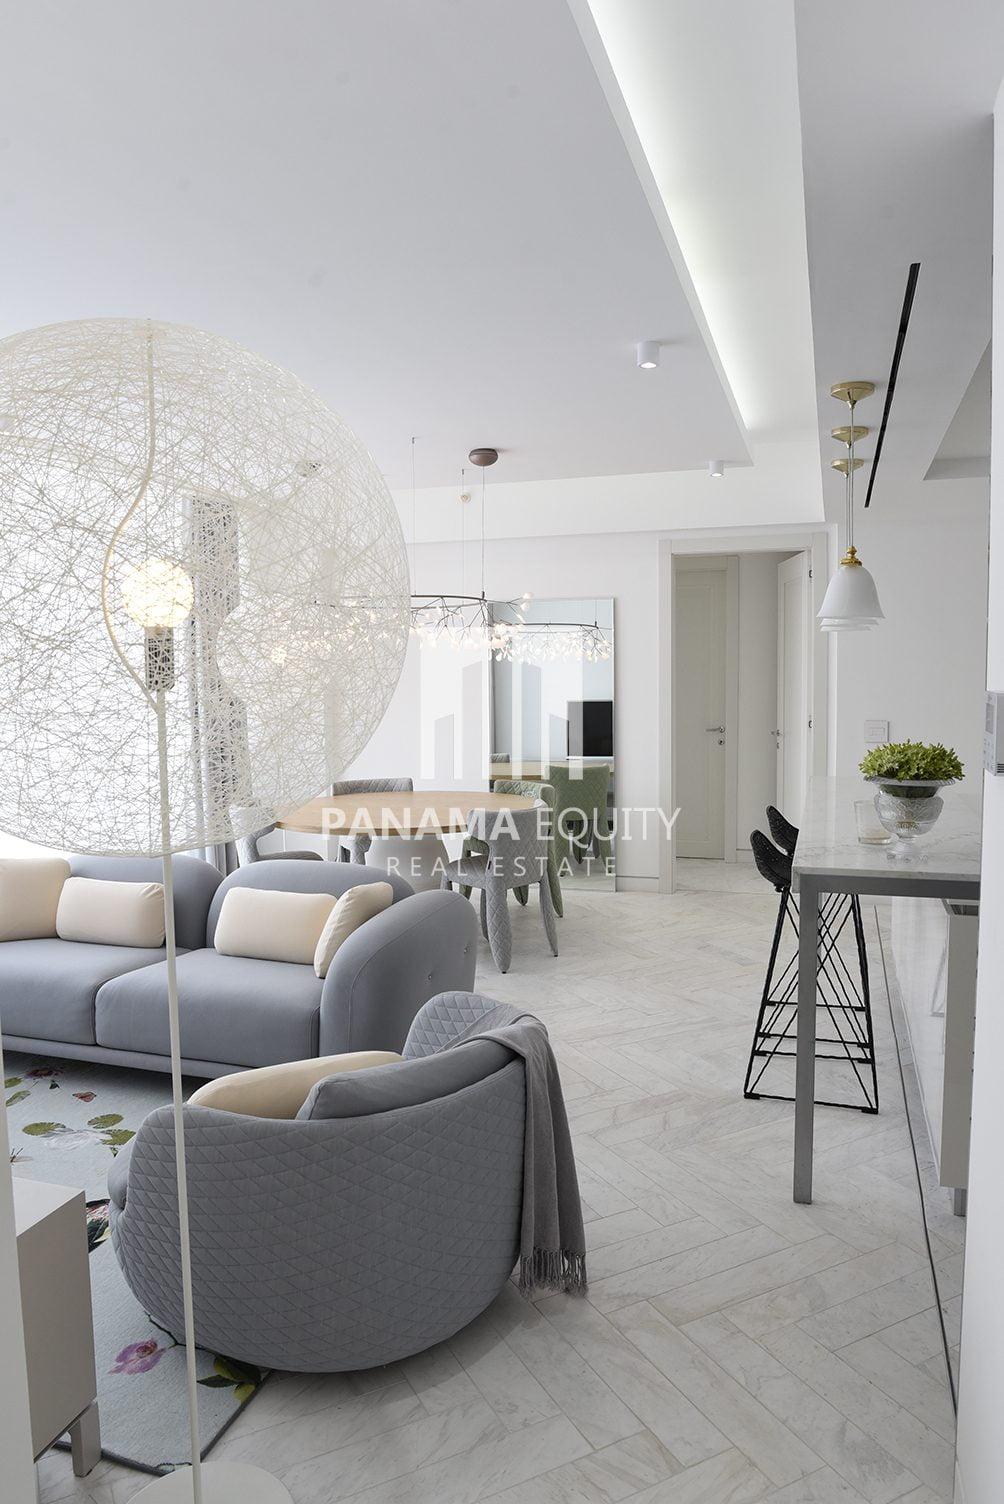 NEW! Luxury Two Bedroom HYDE by Wanders Panama Condo Pre-sale!